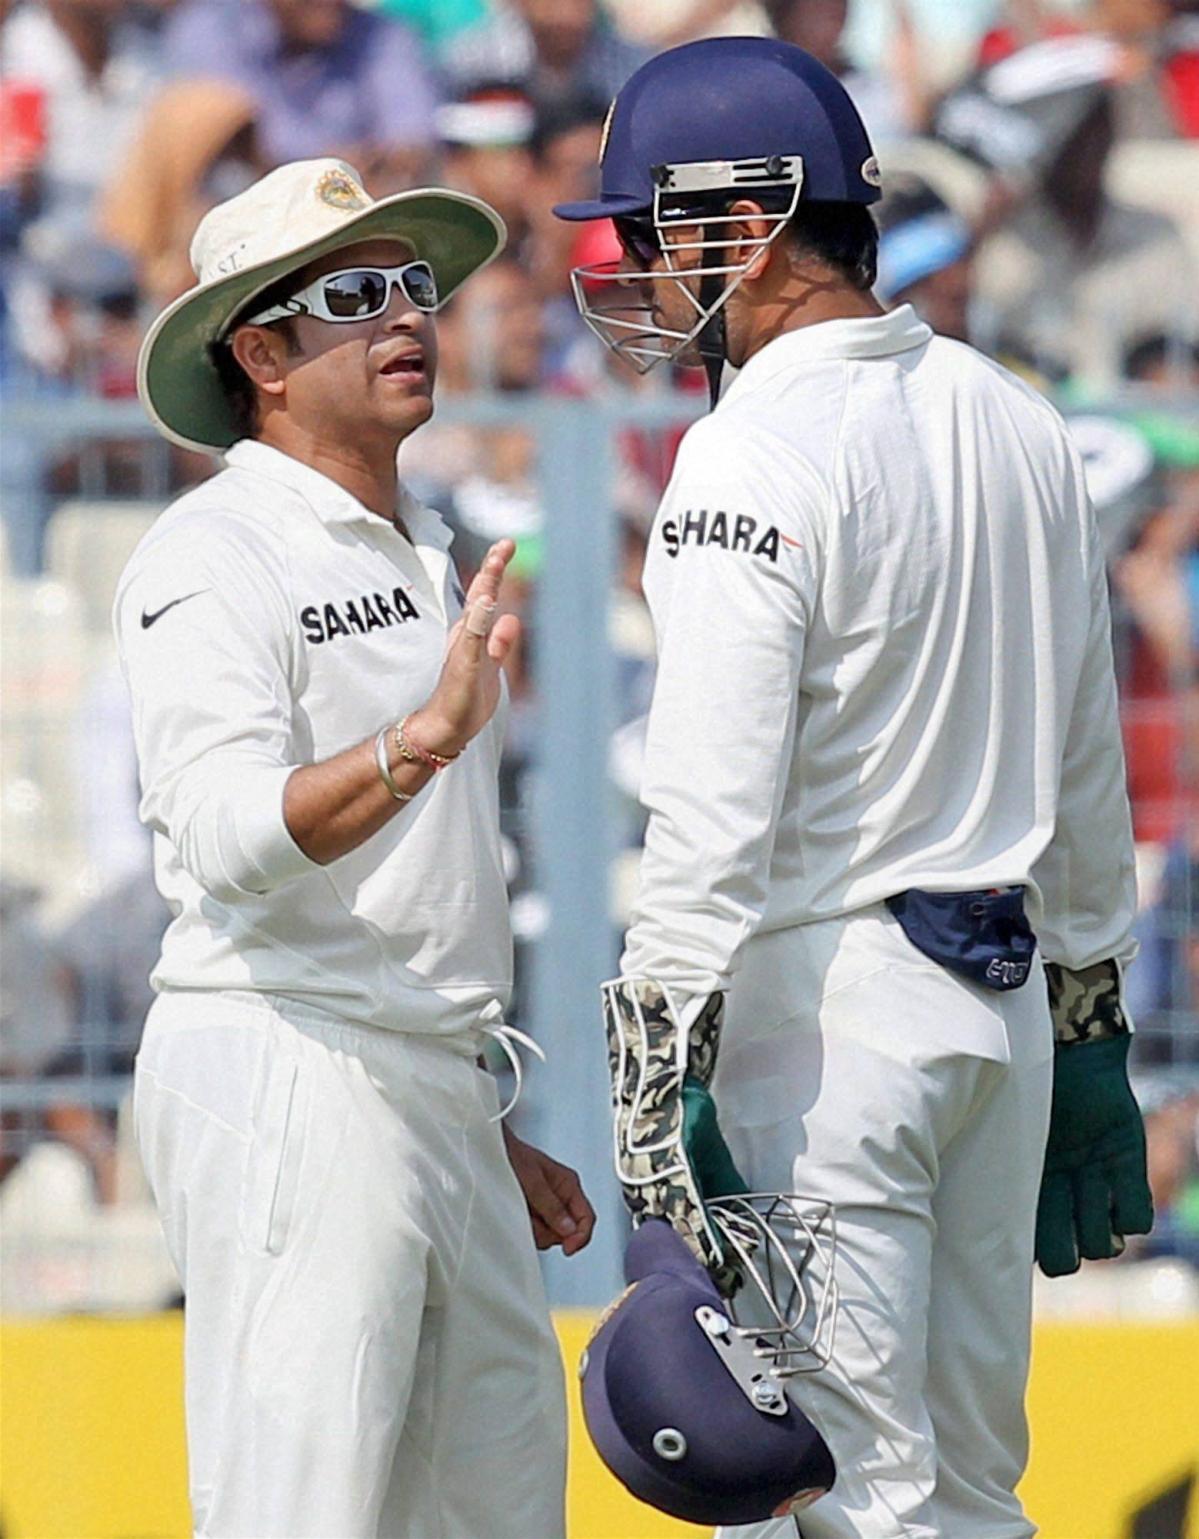 Sachin gets a captain's salute